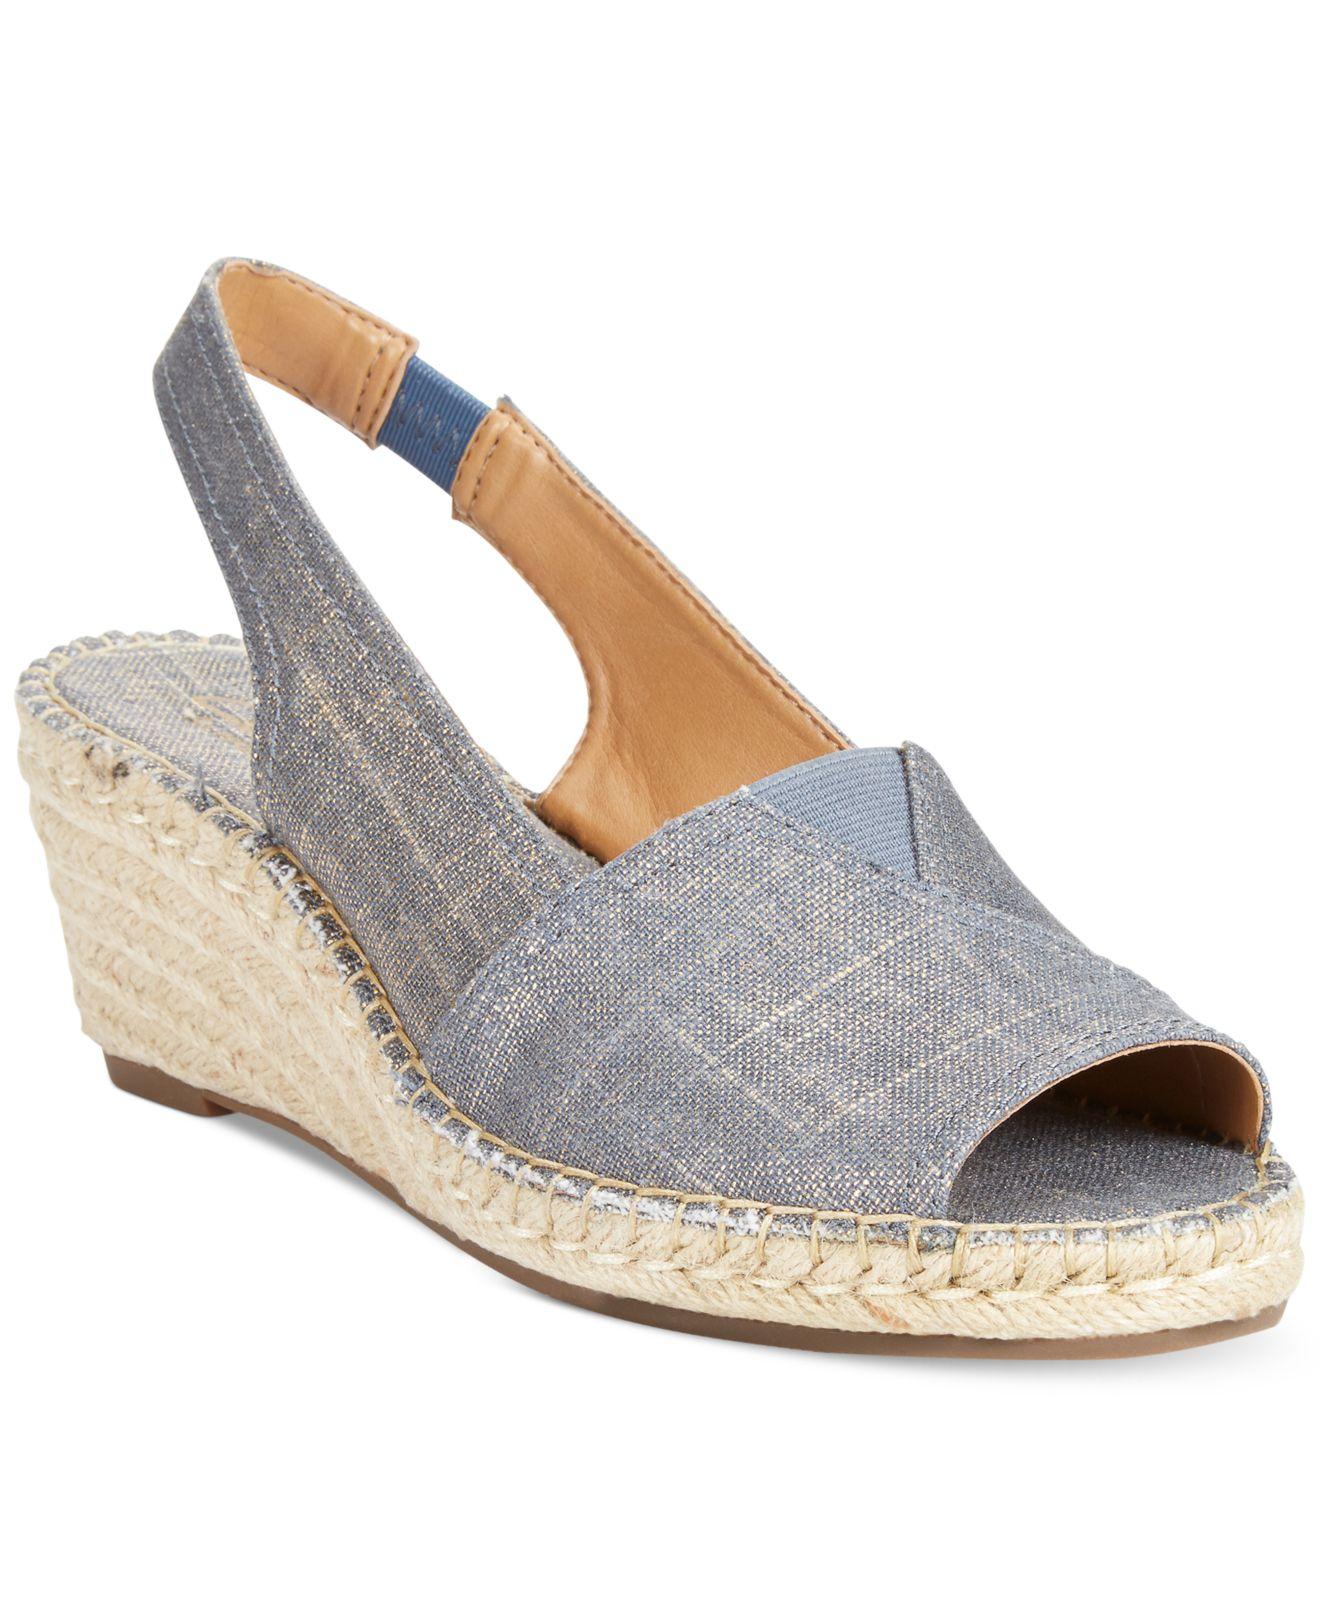 4db934bdadb Clarks Blue Artisan Women'S Petrina Rhea Espadrille Wedge Sandals